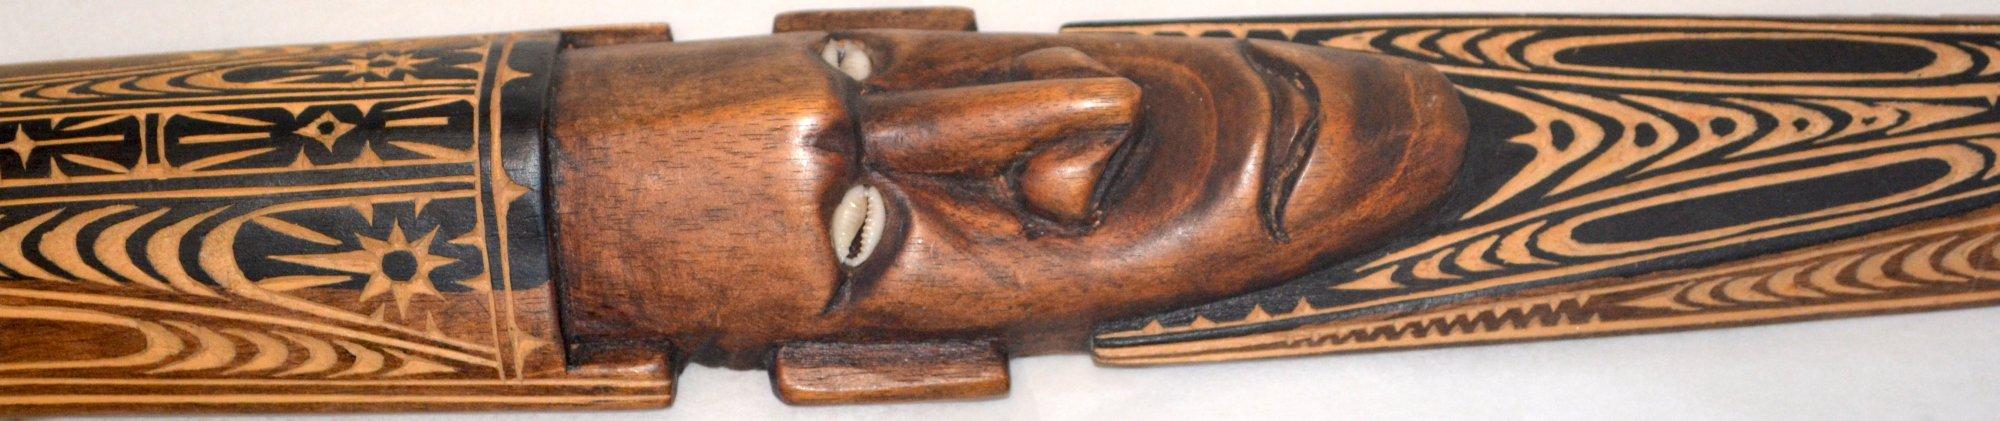 Oceanic Art wooden carved head